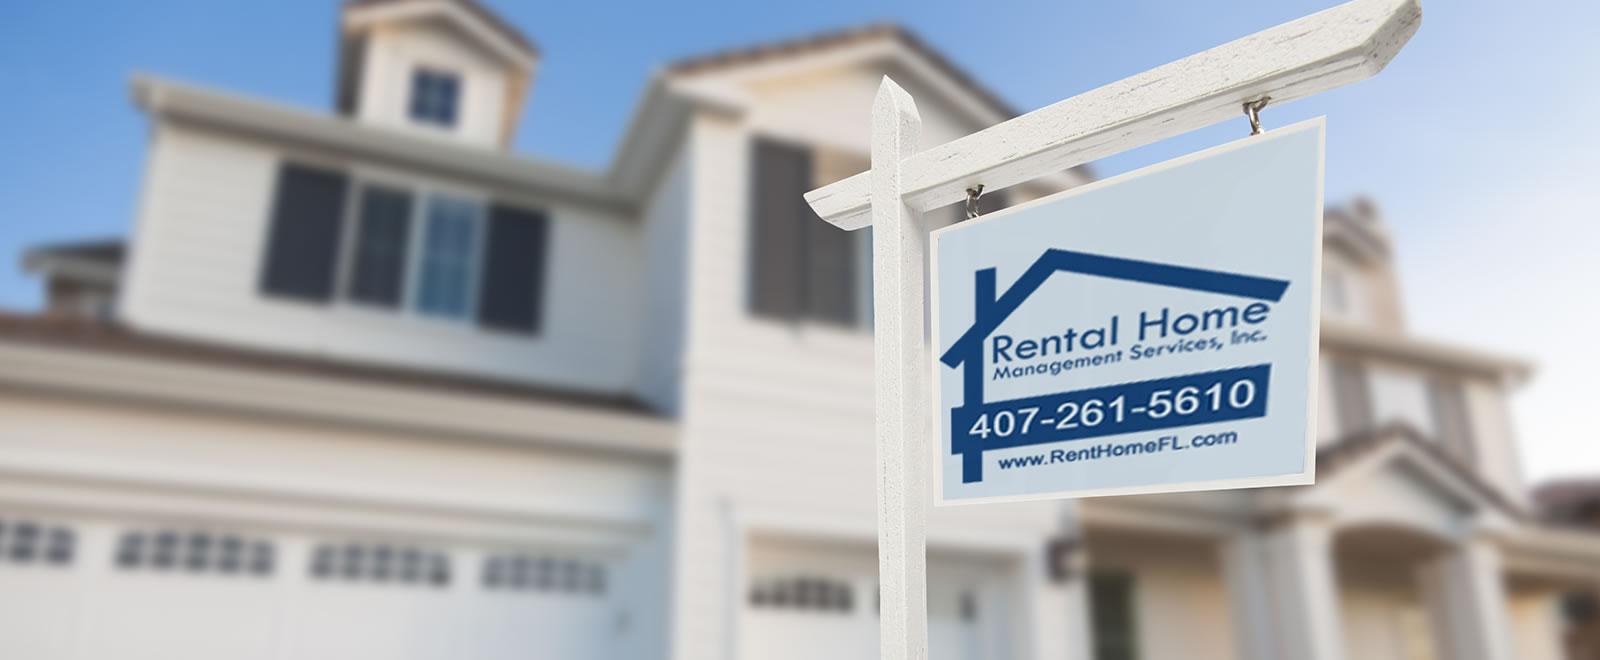 Rental Home Management Services - Property Management Winter Garden ...